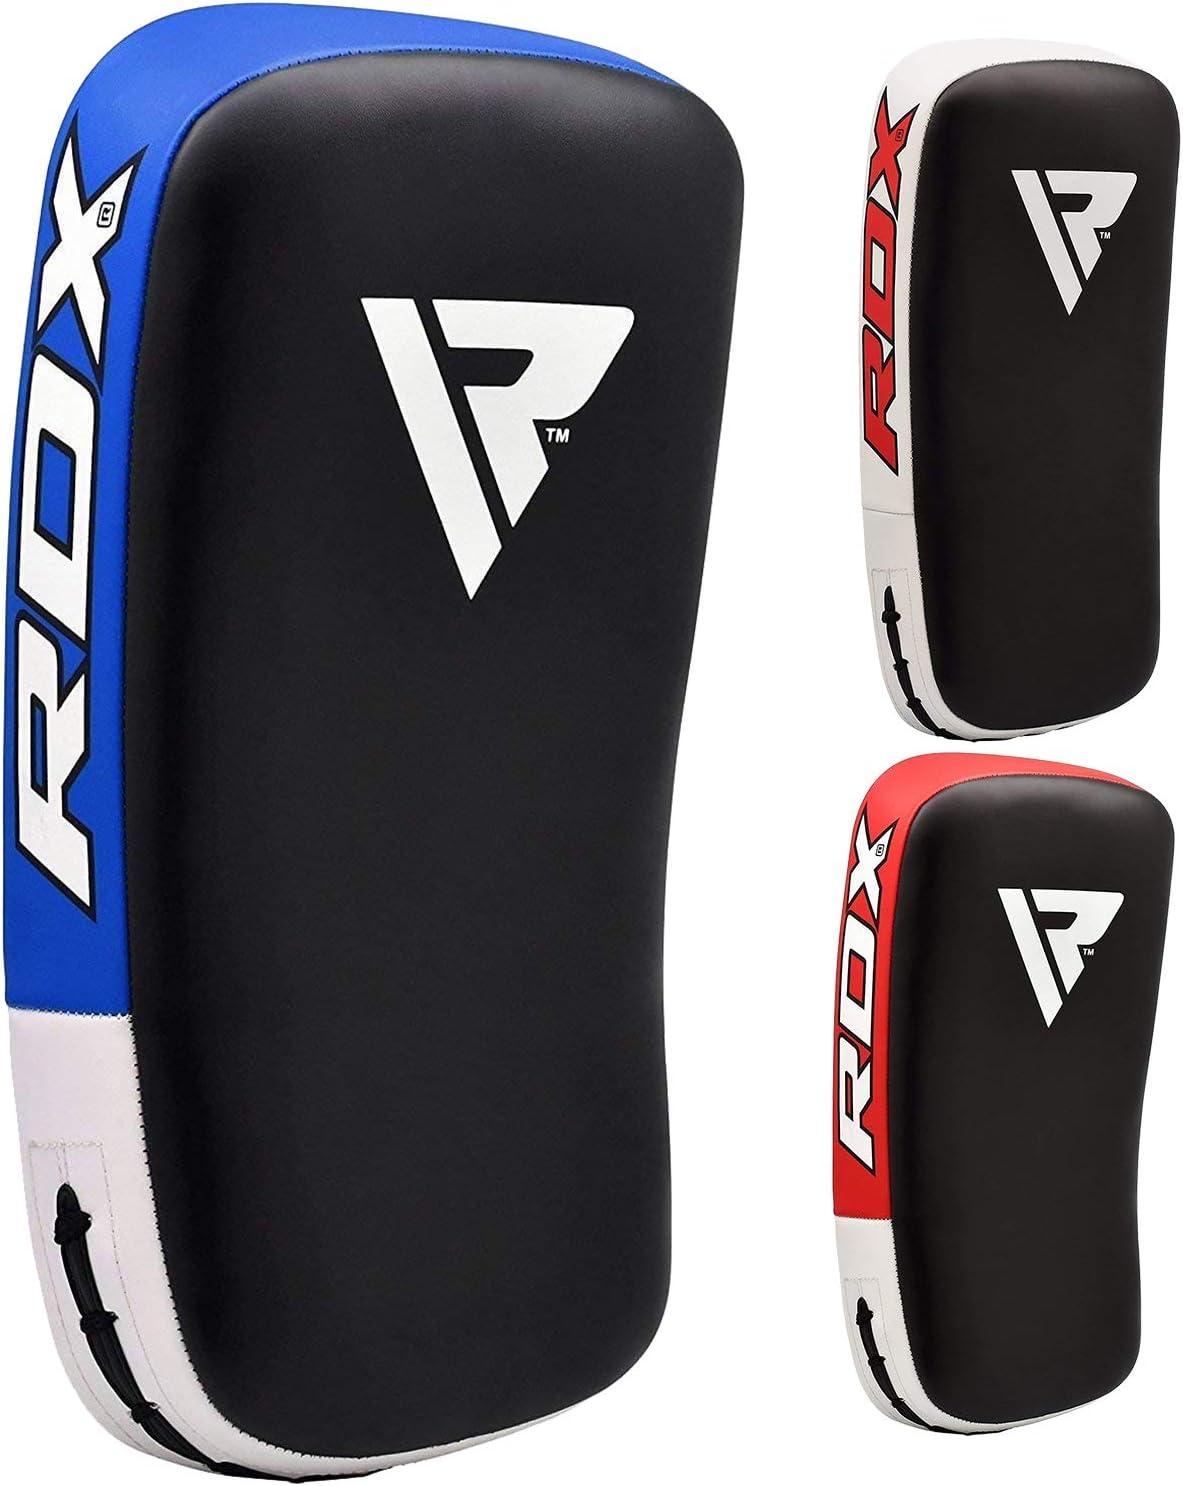 RDX Muay Thai Pad for Training | Curved Kickboxing Kicking Strike Shield | Coaching Kick Boxing, MMA, Martial Arts, Karate, Taekwondo | Punching, Foot, Knee and Elbow Target (1 Pcs Sold AS Single)